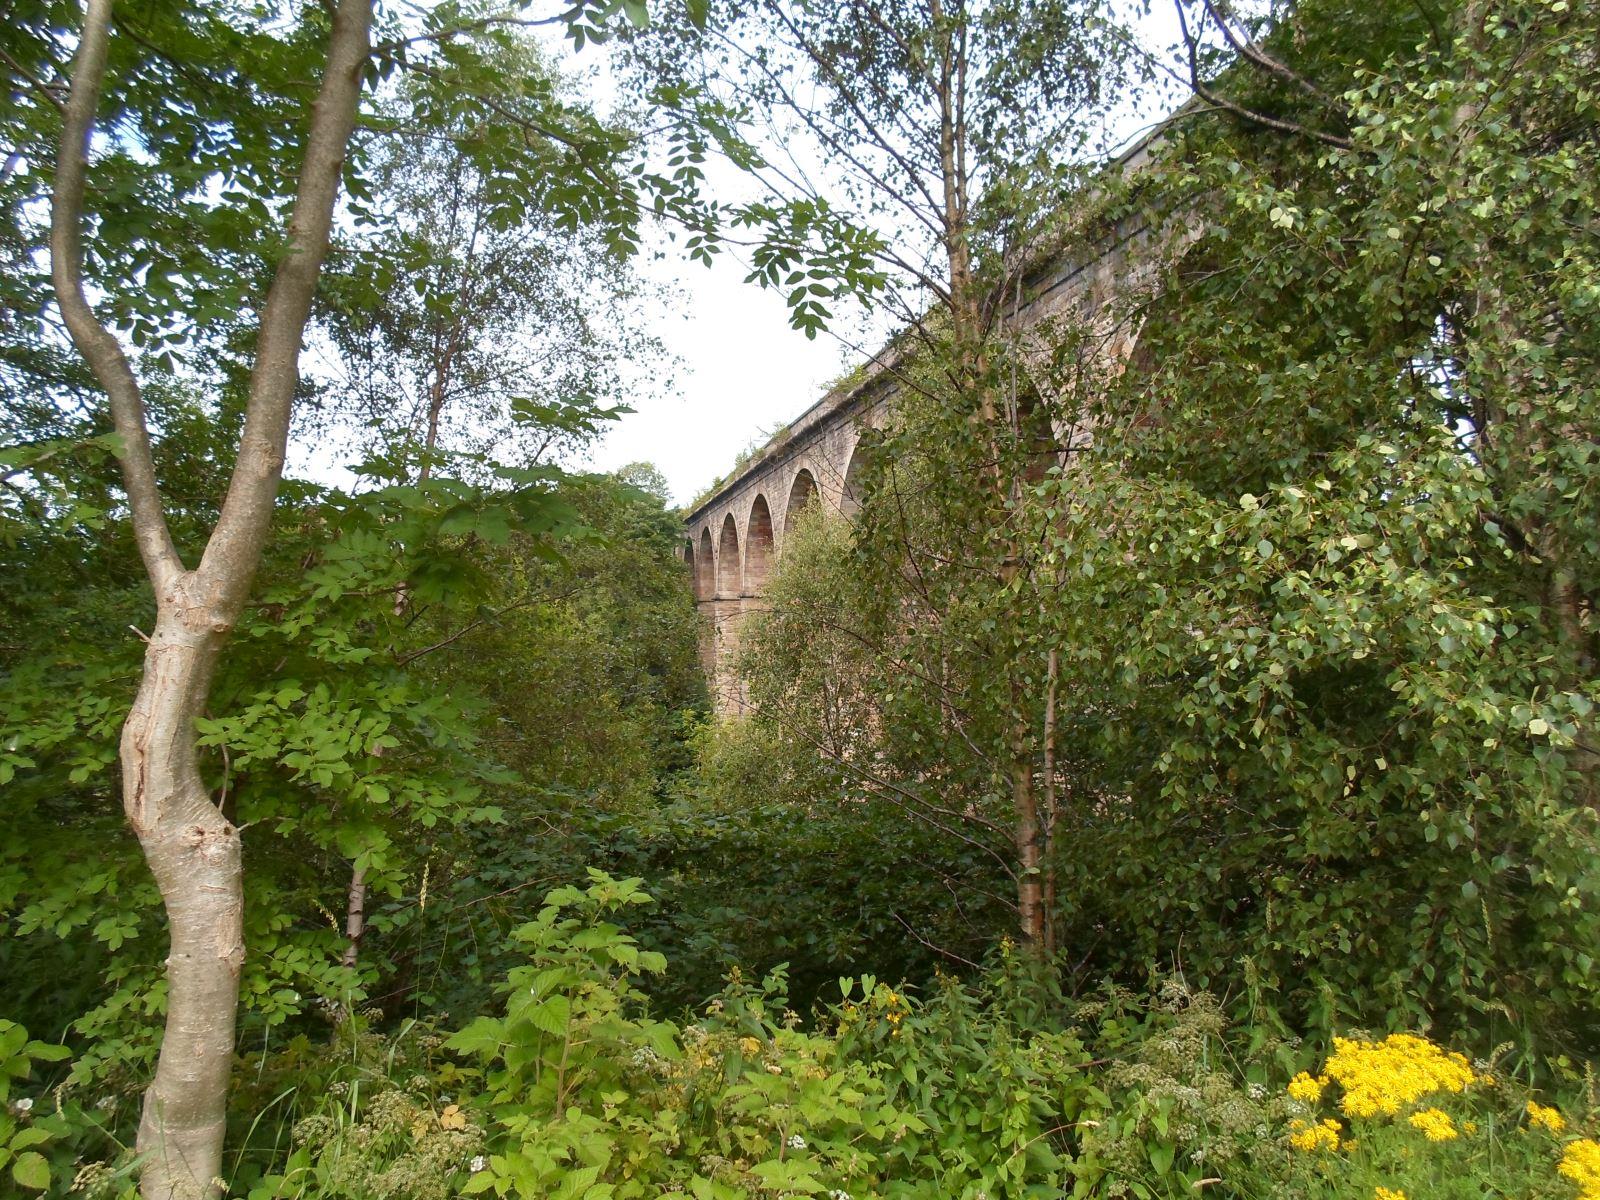 John Miller's tree-girt viaduct crossing Lugar Water at Cumnock